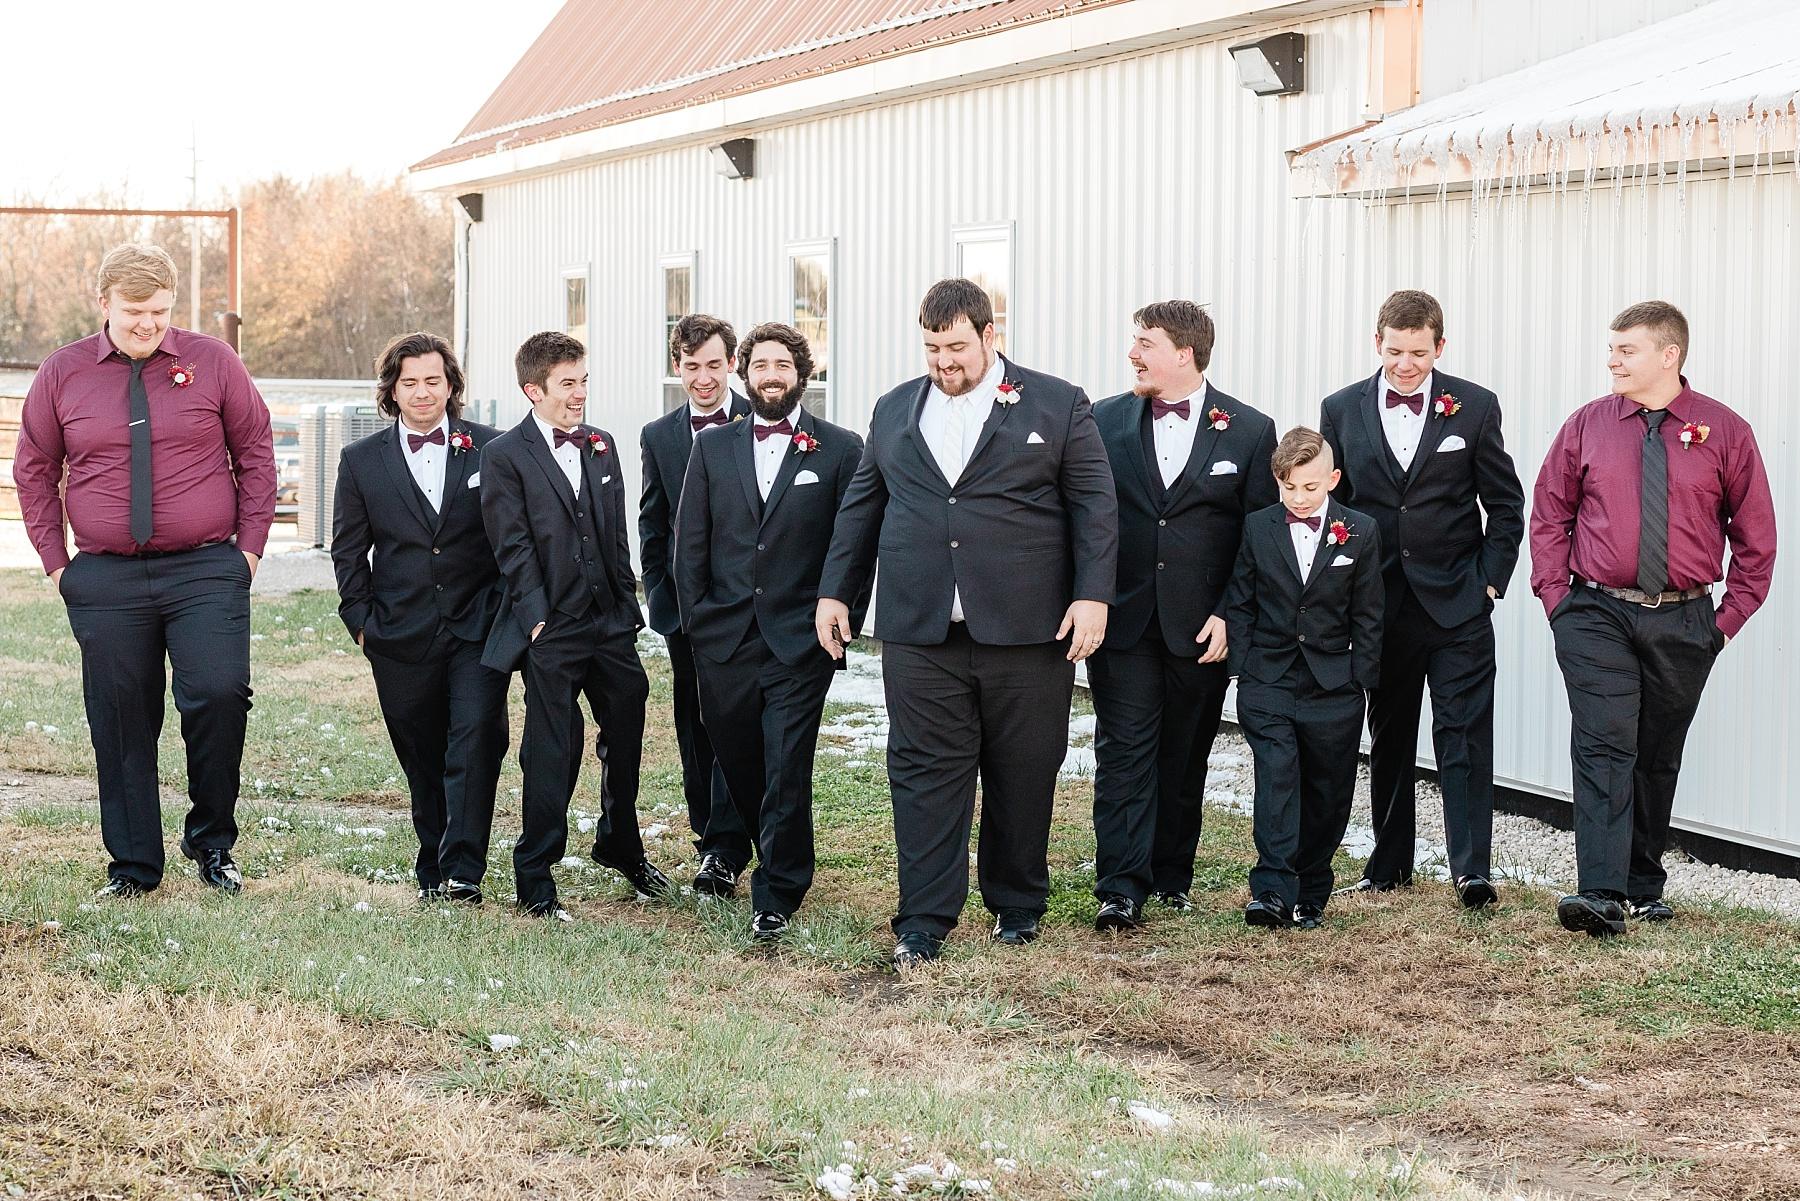 Golden Winter Wedding at The Legacy Barn in Barnett Missouri by Kelsi Kliethermes Photography Columbia Missouri Wedding Photographer_0005.jpg